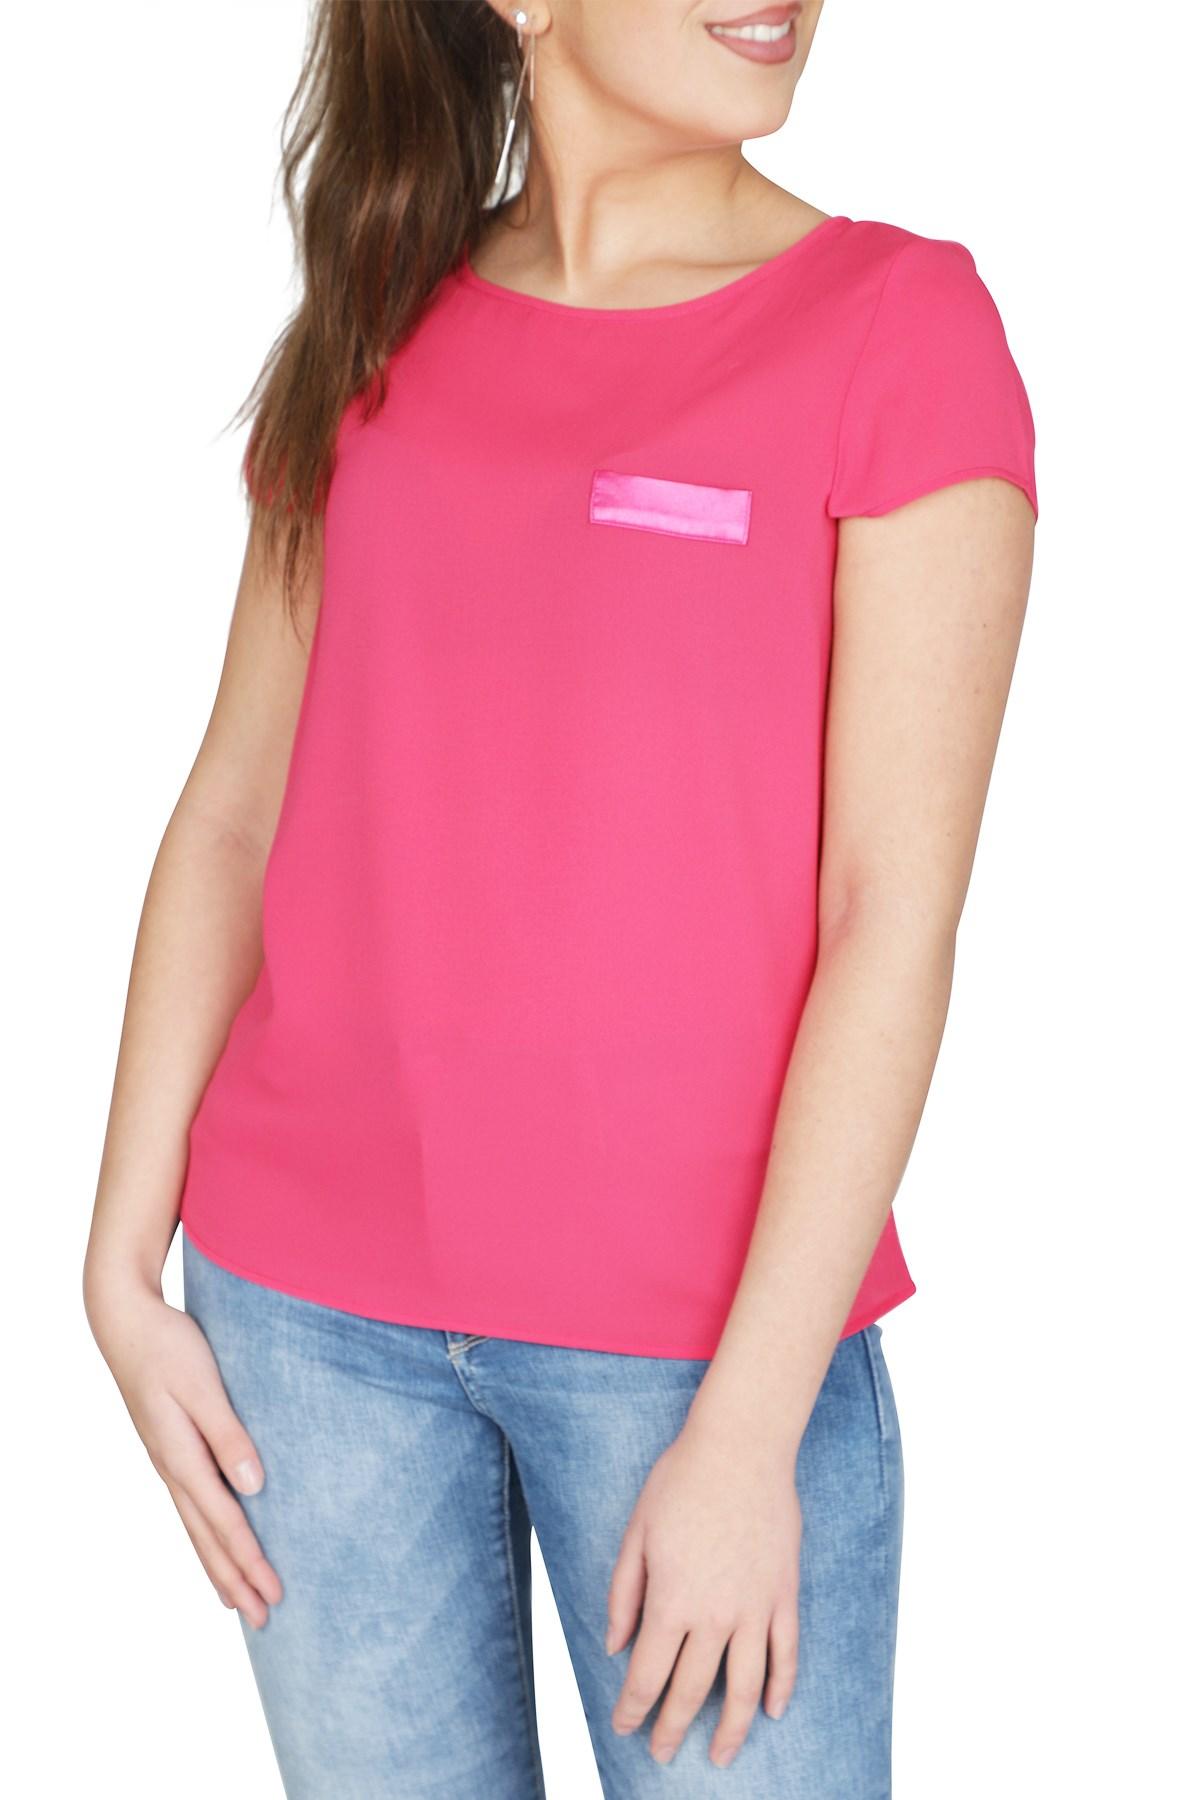 Geisha Shirt - Top Fuchsia 93013-10